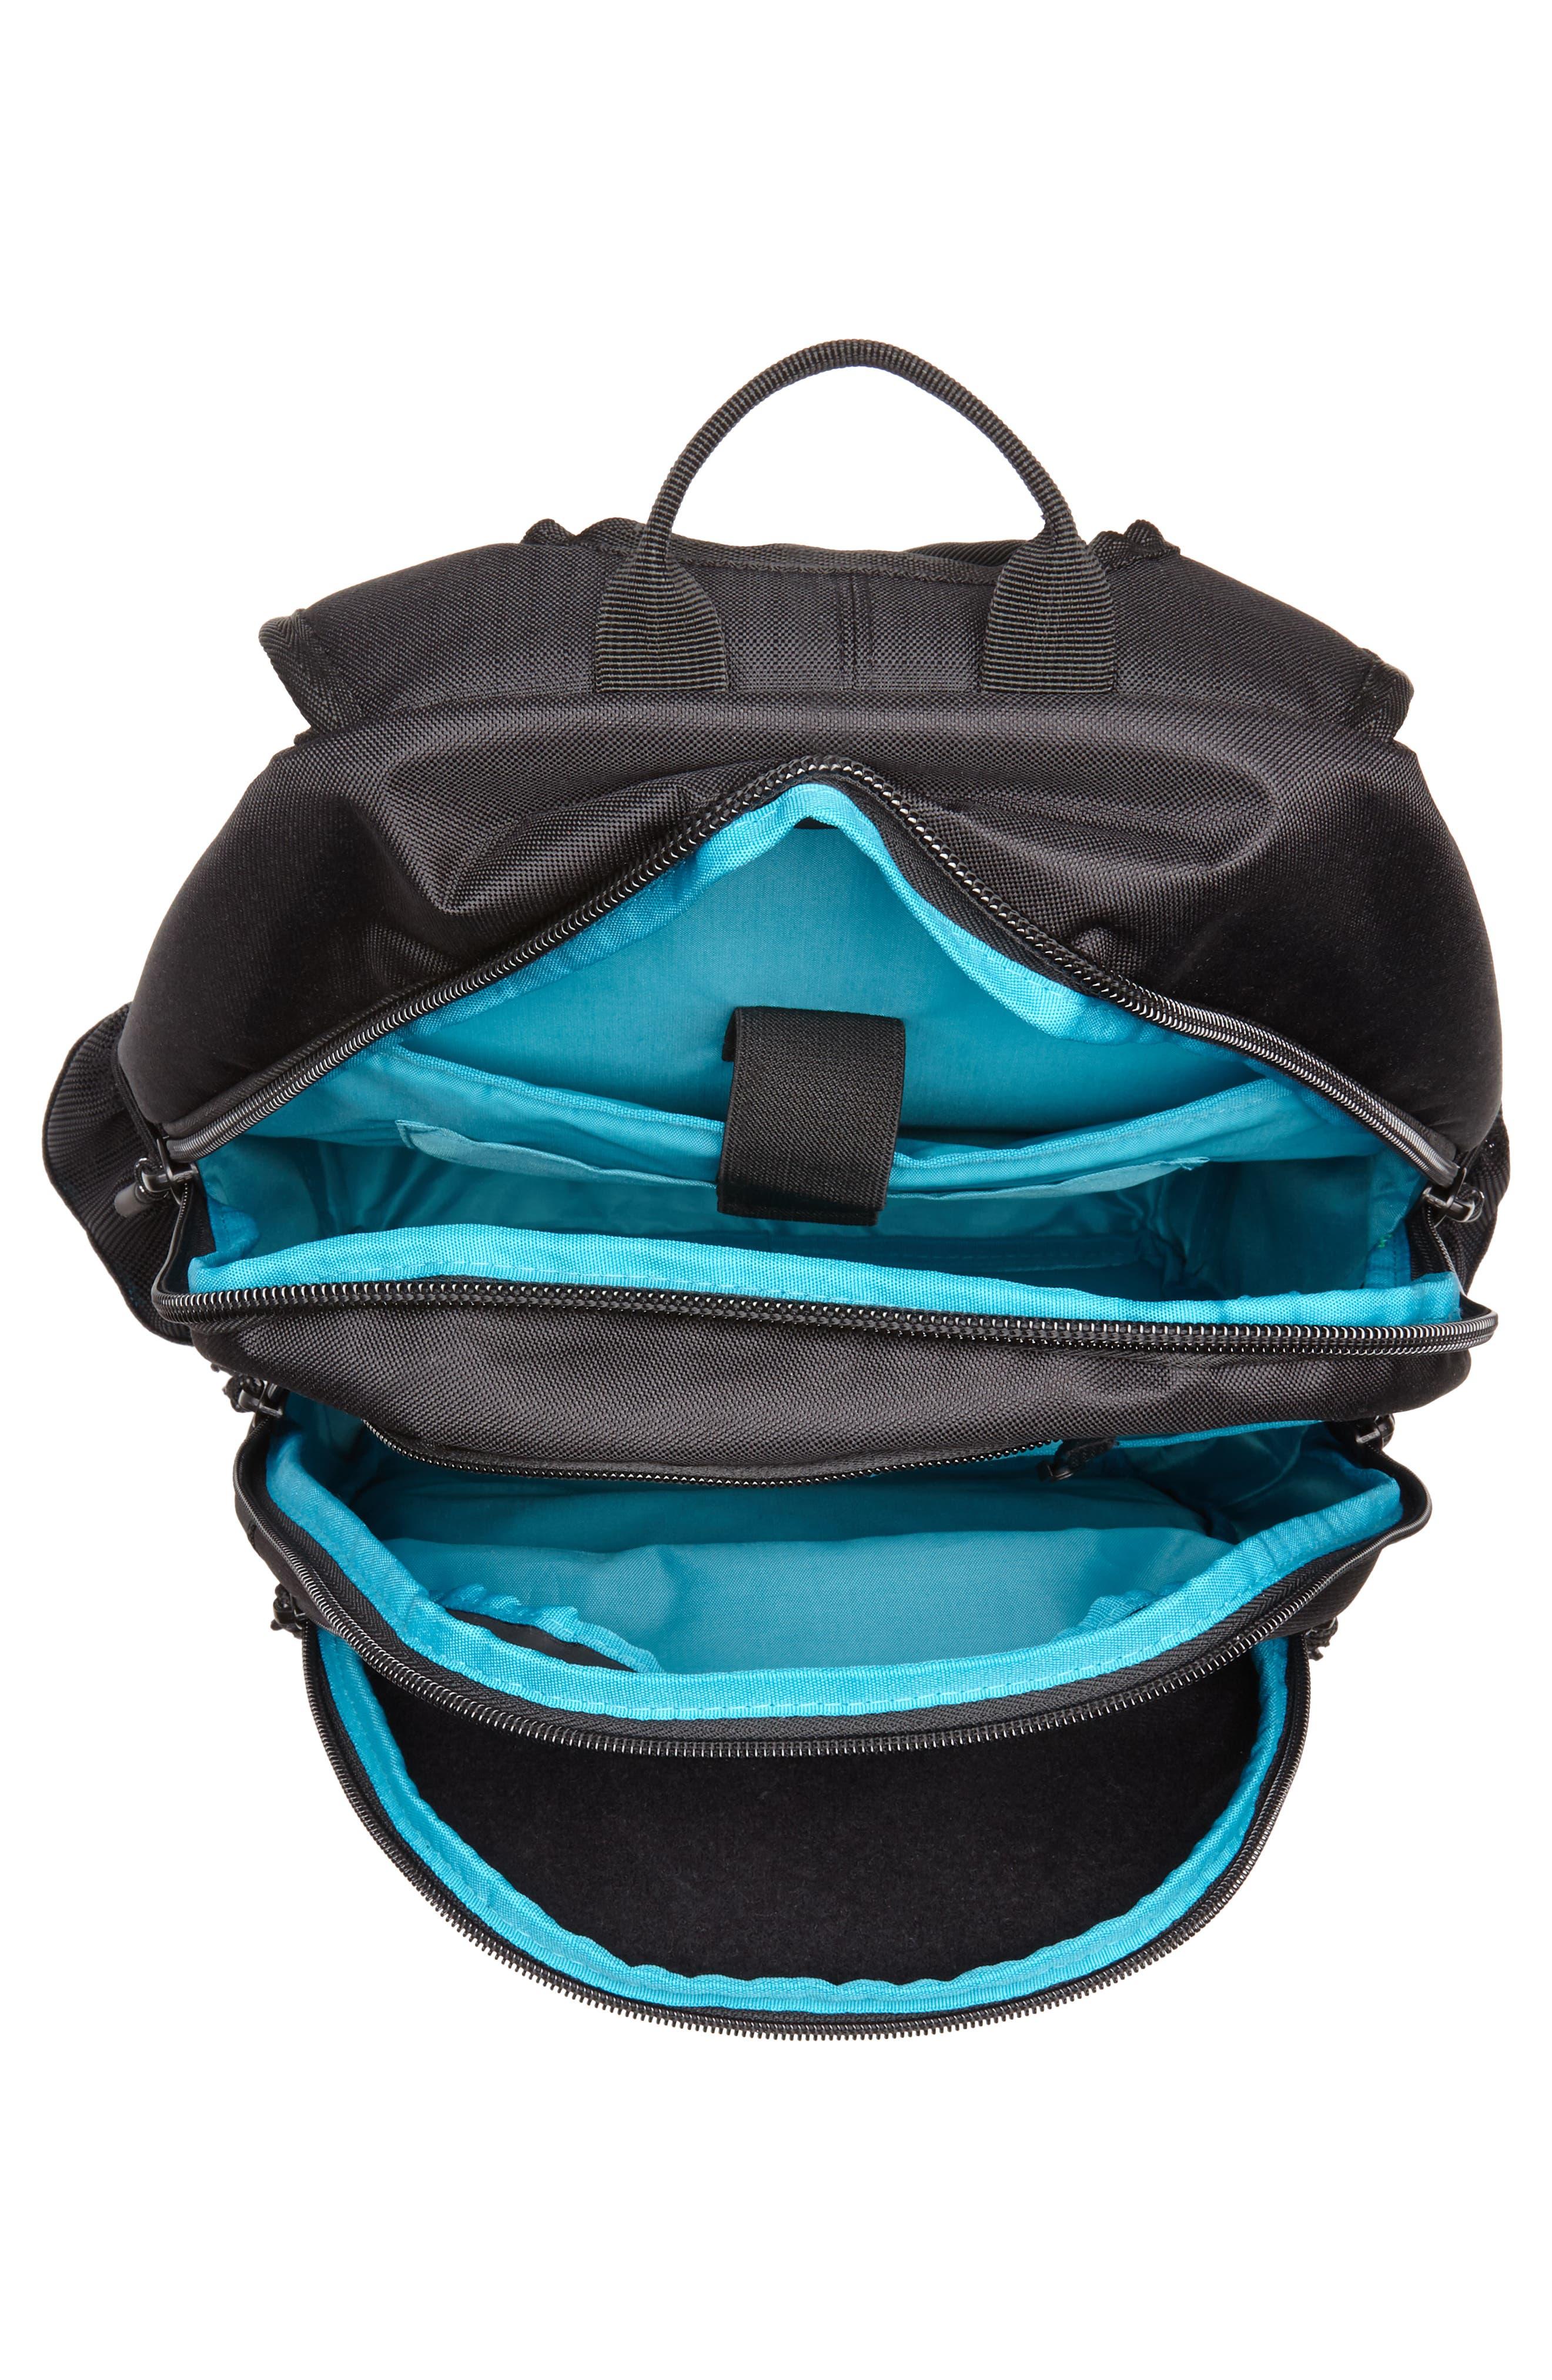 Traverse Backpack,                             Alternate thumbnail 4, color,                             001